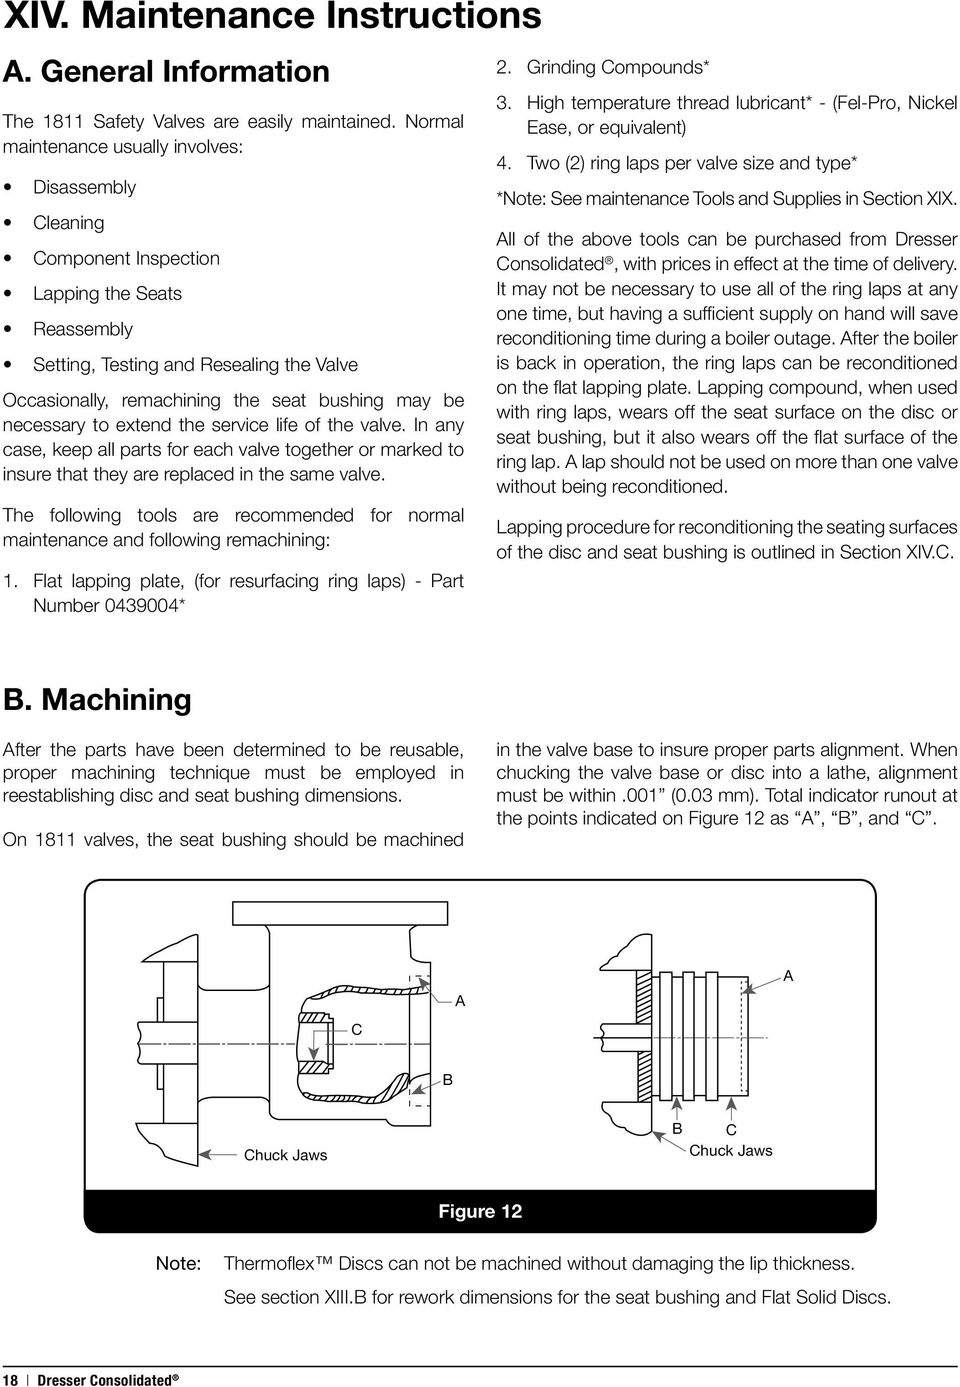 Pressure Relief Valves Series  Maintenance Manual